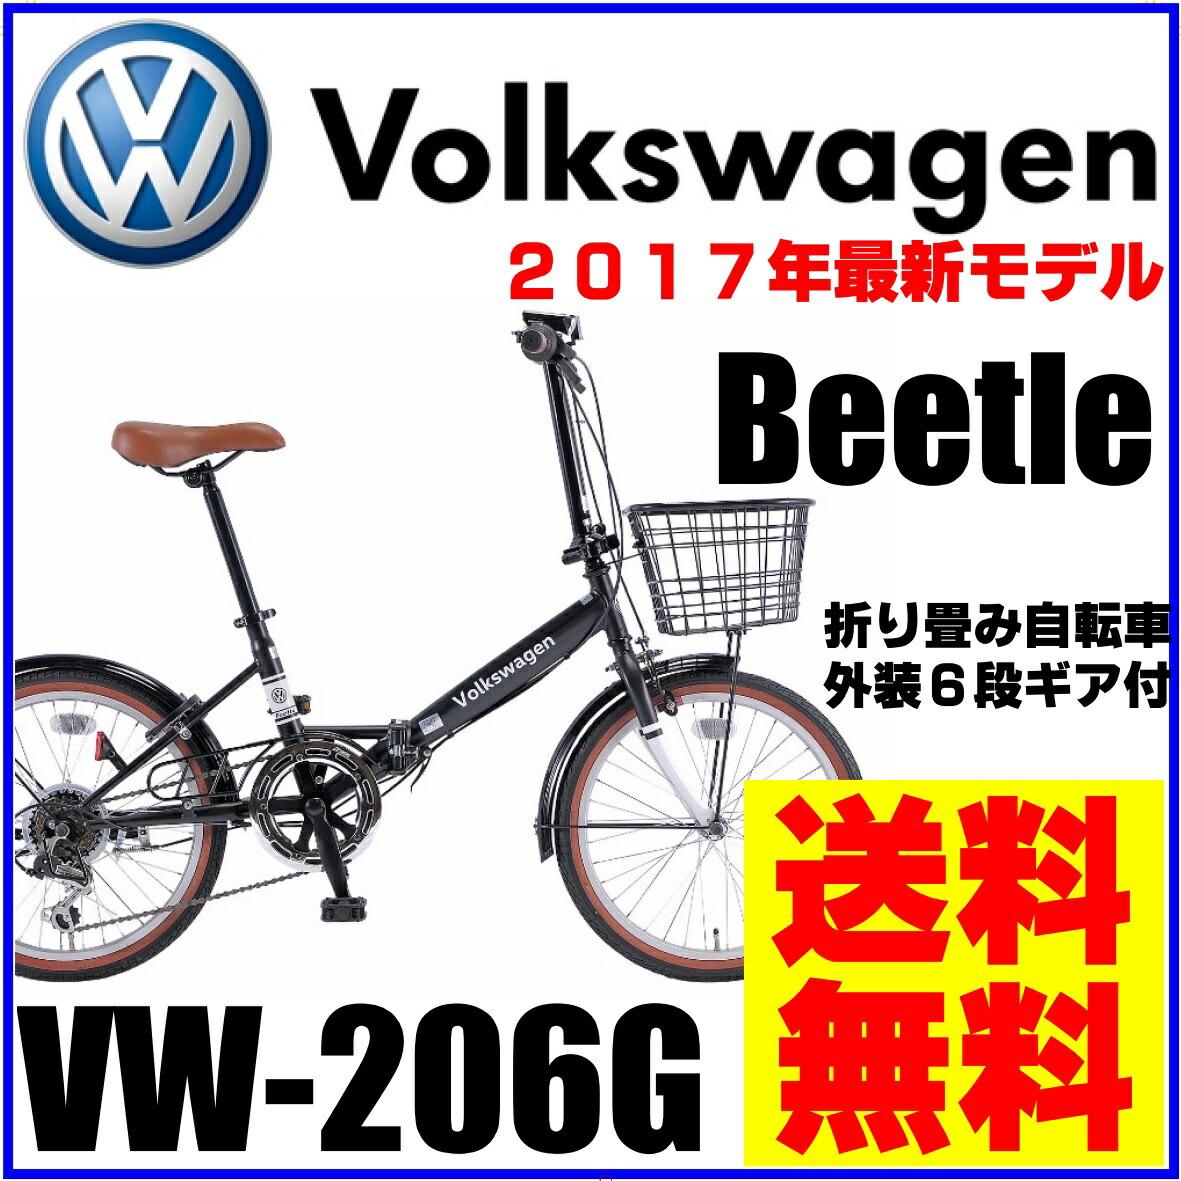 BAA 折りたたみ自転車 フォルクスワーゲン Volkswagen 自転車 ブラック 黒 20インチ 自転車 外装6段 フォルクスワーゲン VW-206G Beetle ビートル 売切御免